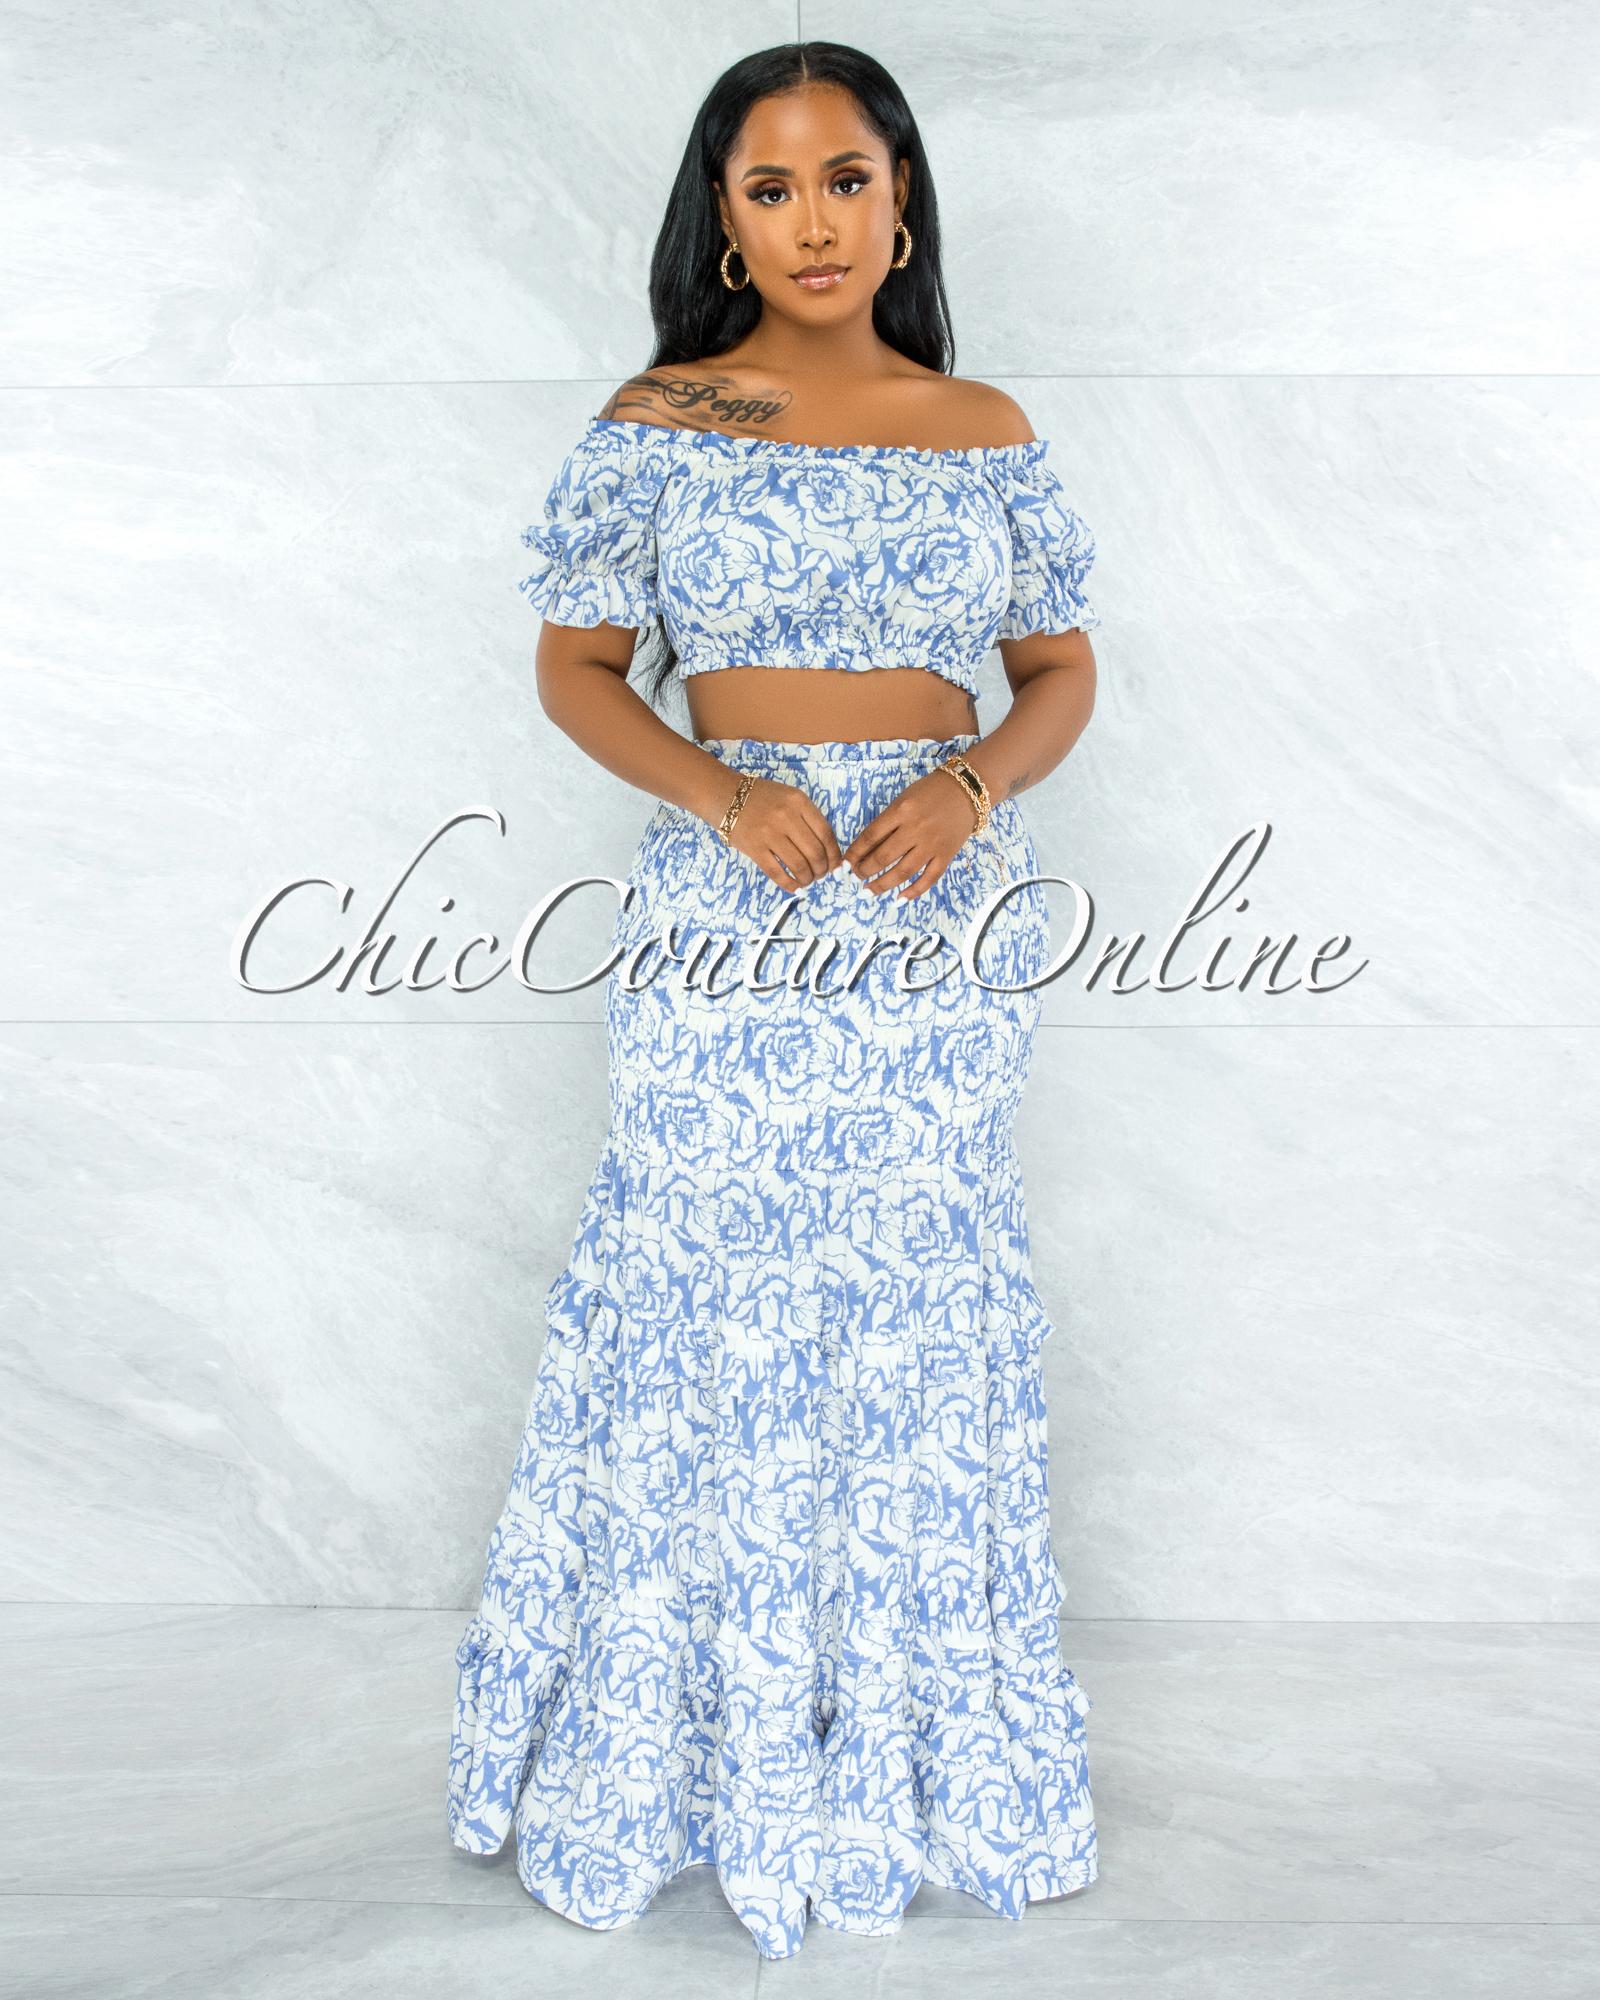 Pitney Periwinkle Blue Floral Print Top & Skirt Smocked Set